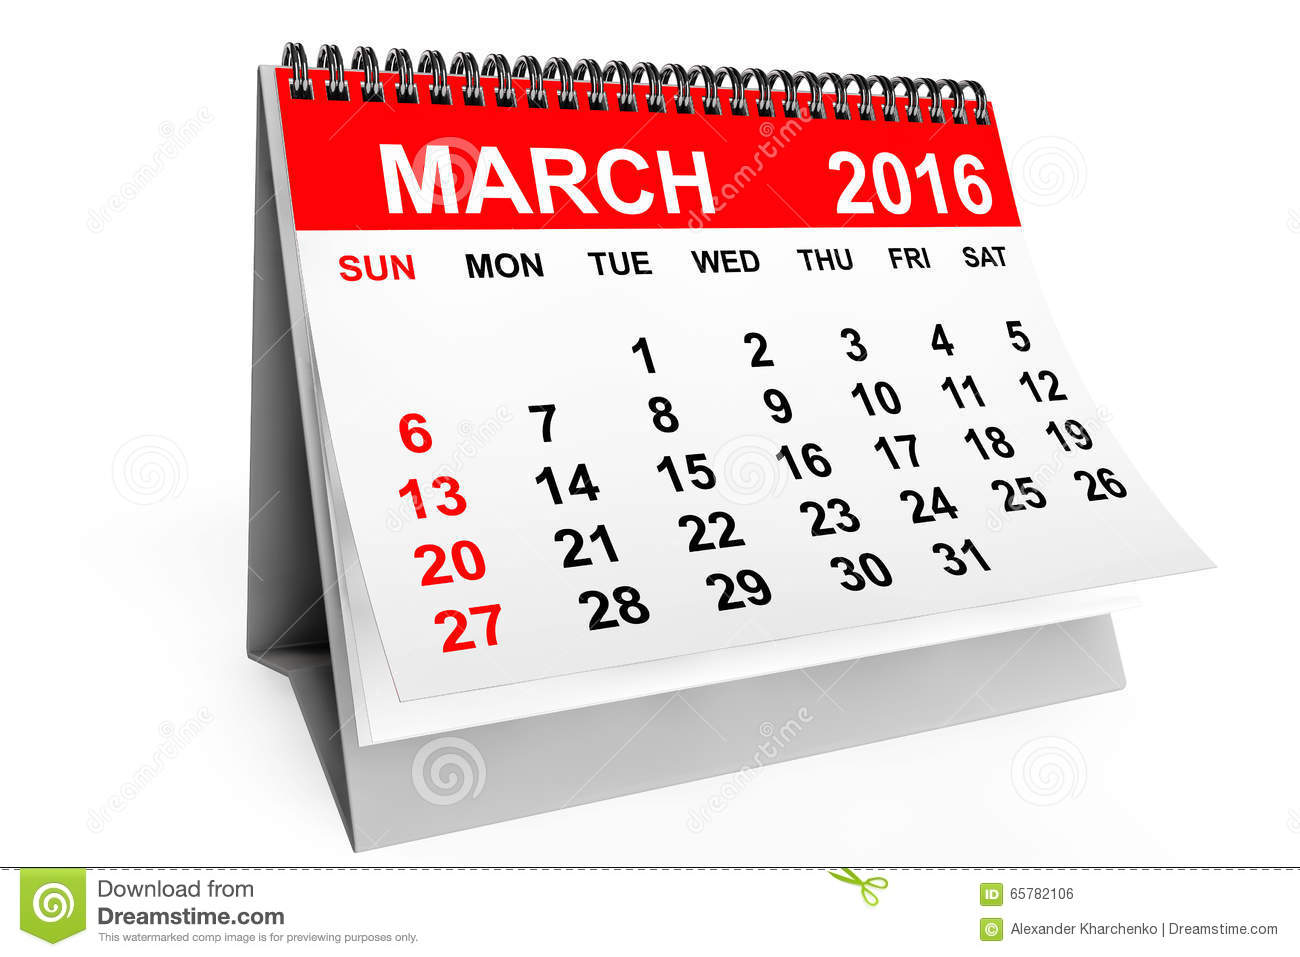 March 2016 calendar clipart vector freeuse stock Calendar March 2016 Stock Photos, Images, & Pictures - 1,511 Images vector freeuse stock